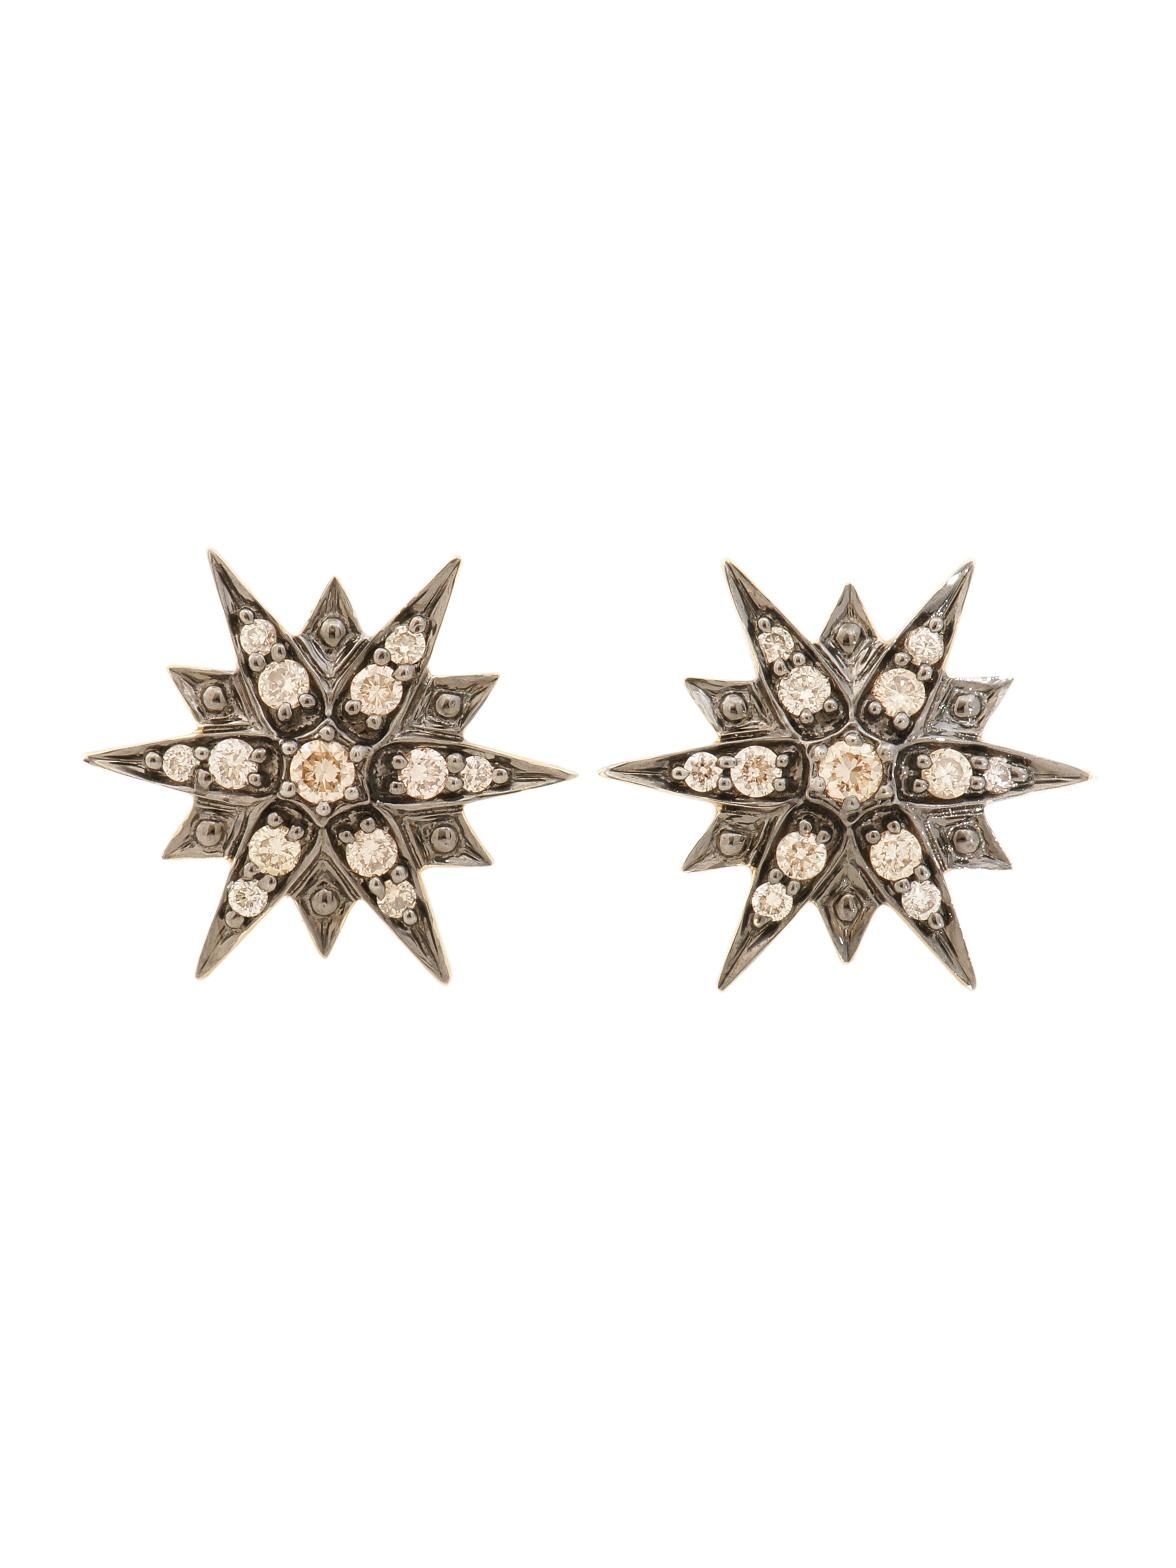 H.Stern Noble Gold Diamond Stud Earrings at London Jewelers.